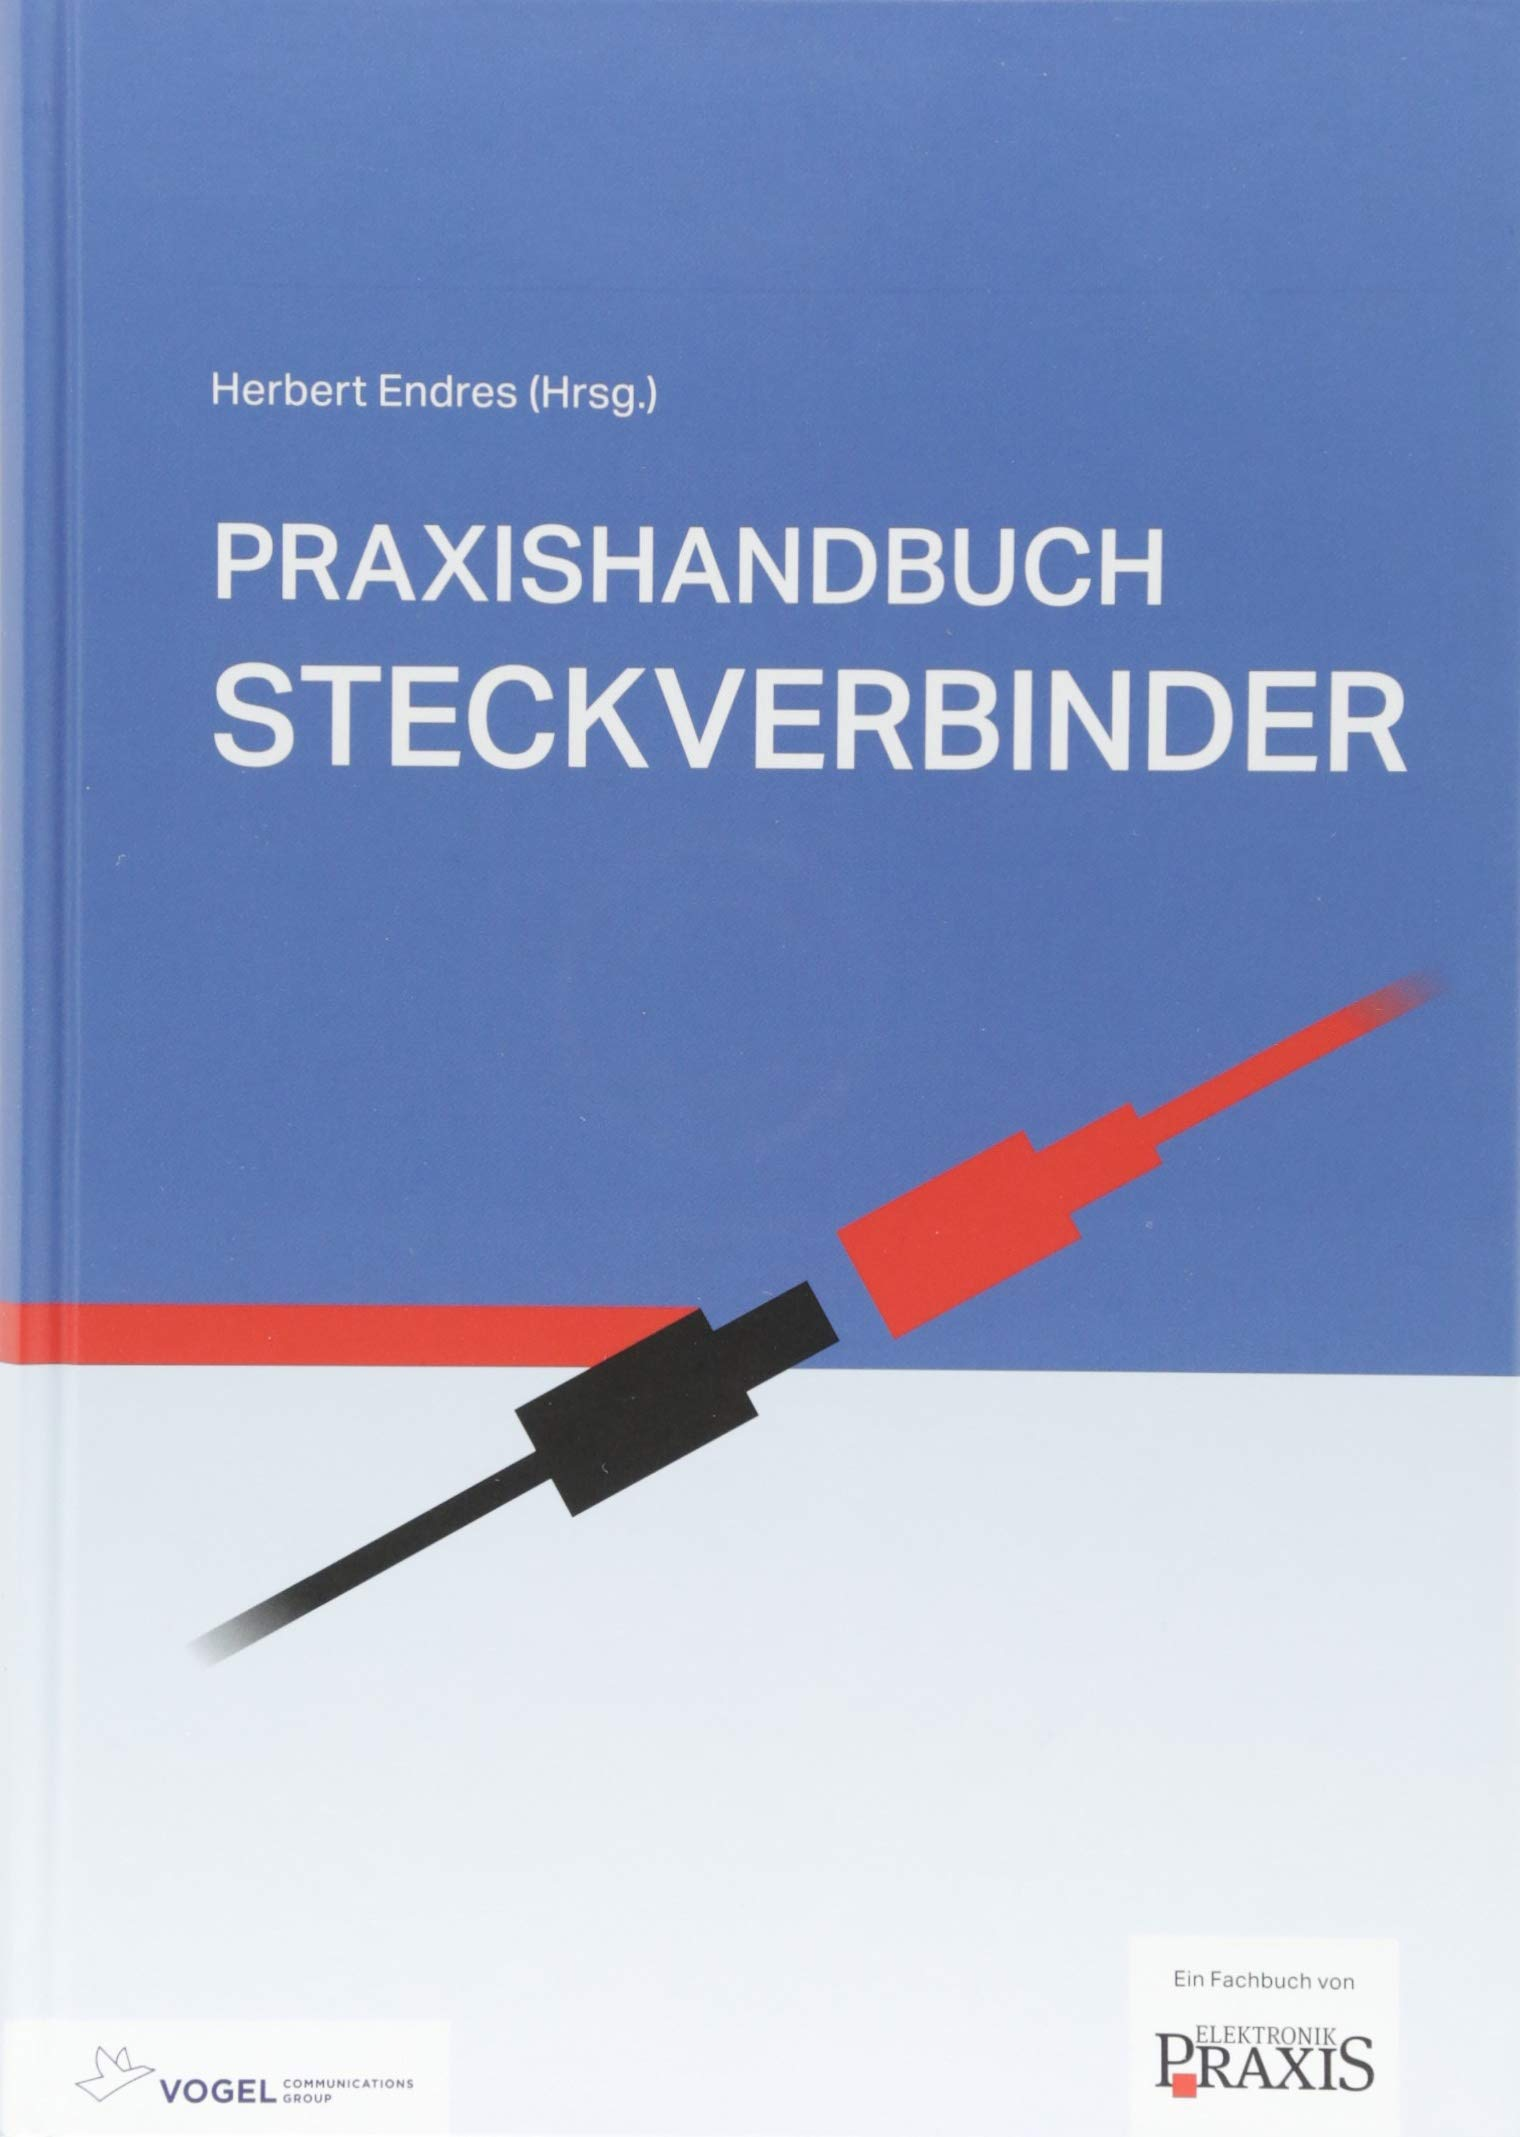 Praxishandbuch Steckverbinder Gebundenes Buch – 2. Juli 2018 Herbert Endres Vogel Business Media 3834334146 978-3-8343-3414-5